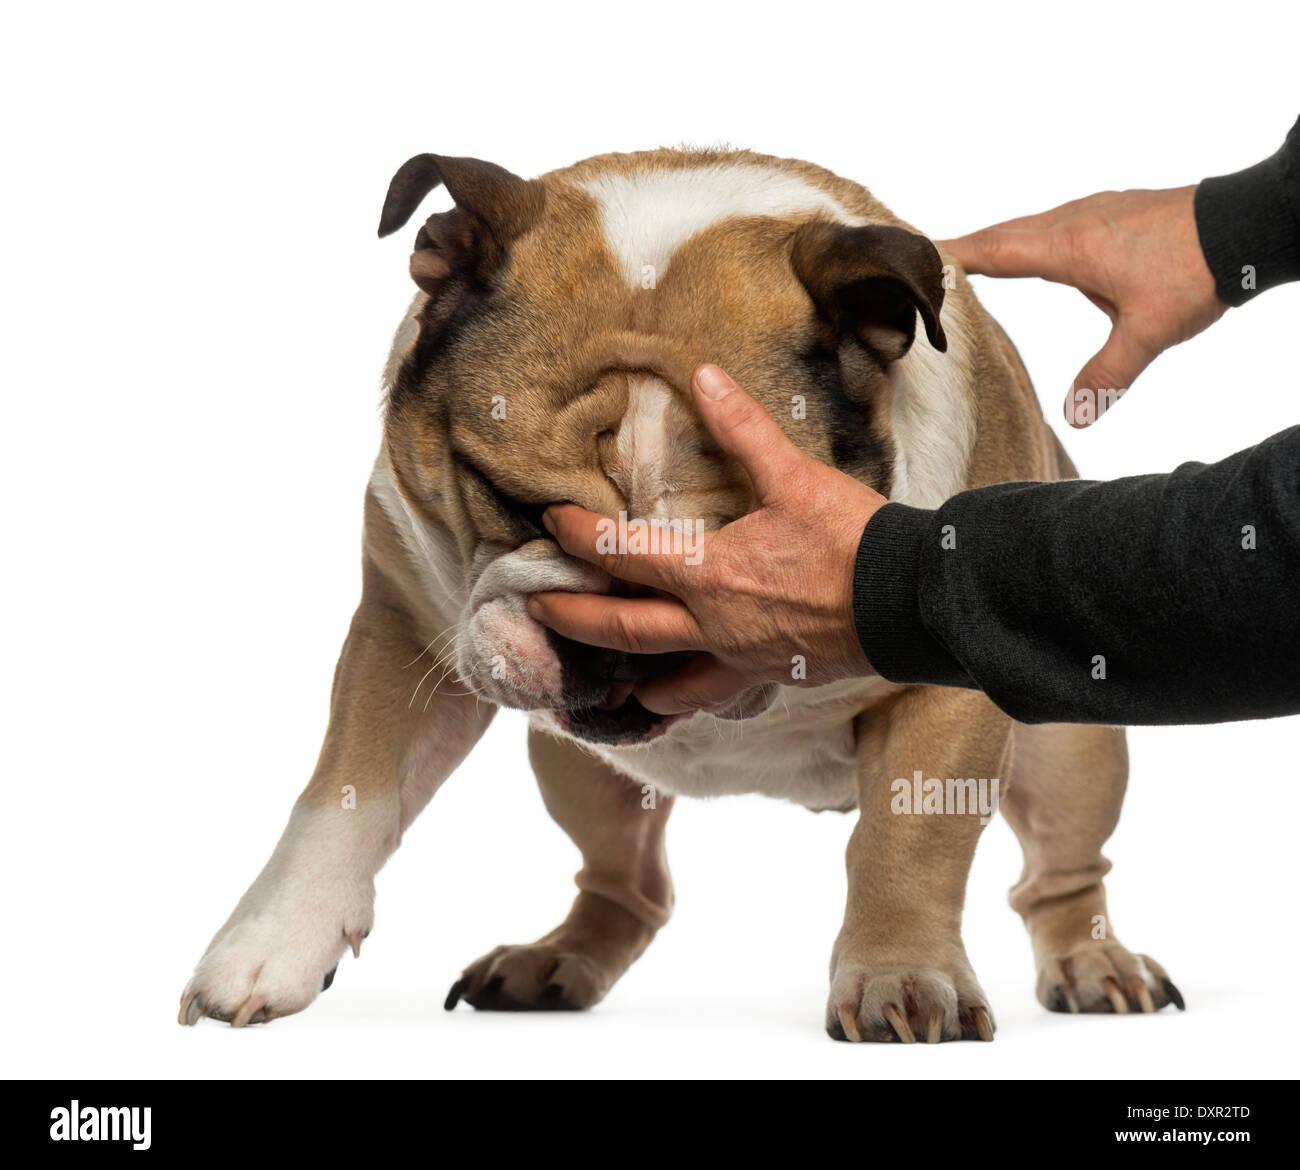 Disobedient English Bulldog against white background - Stock Image